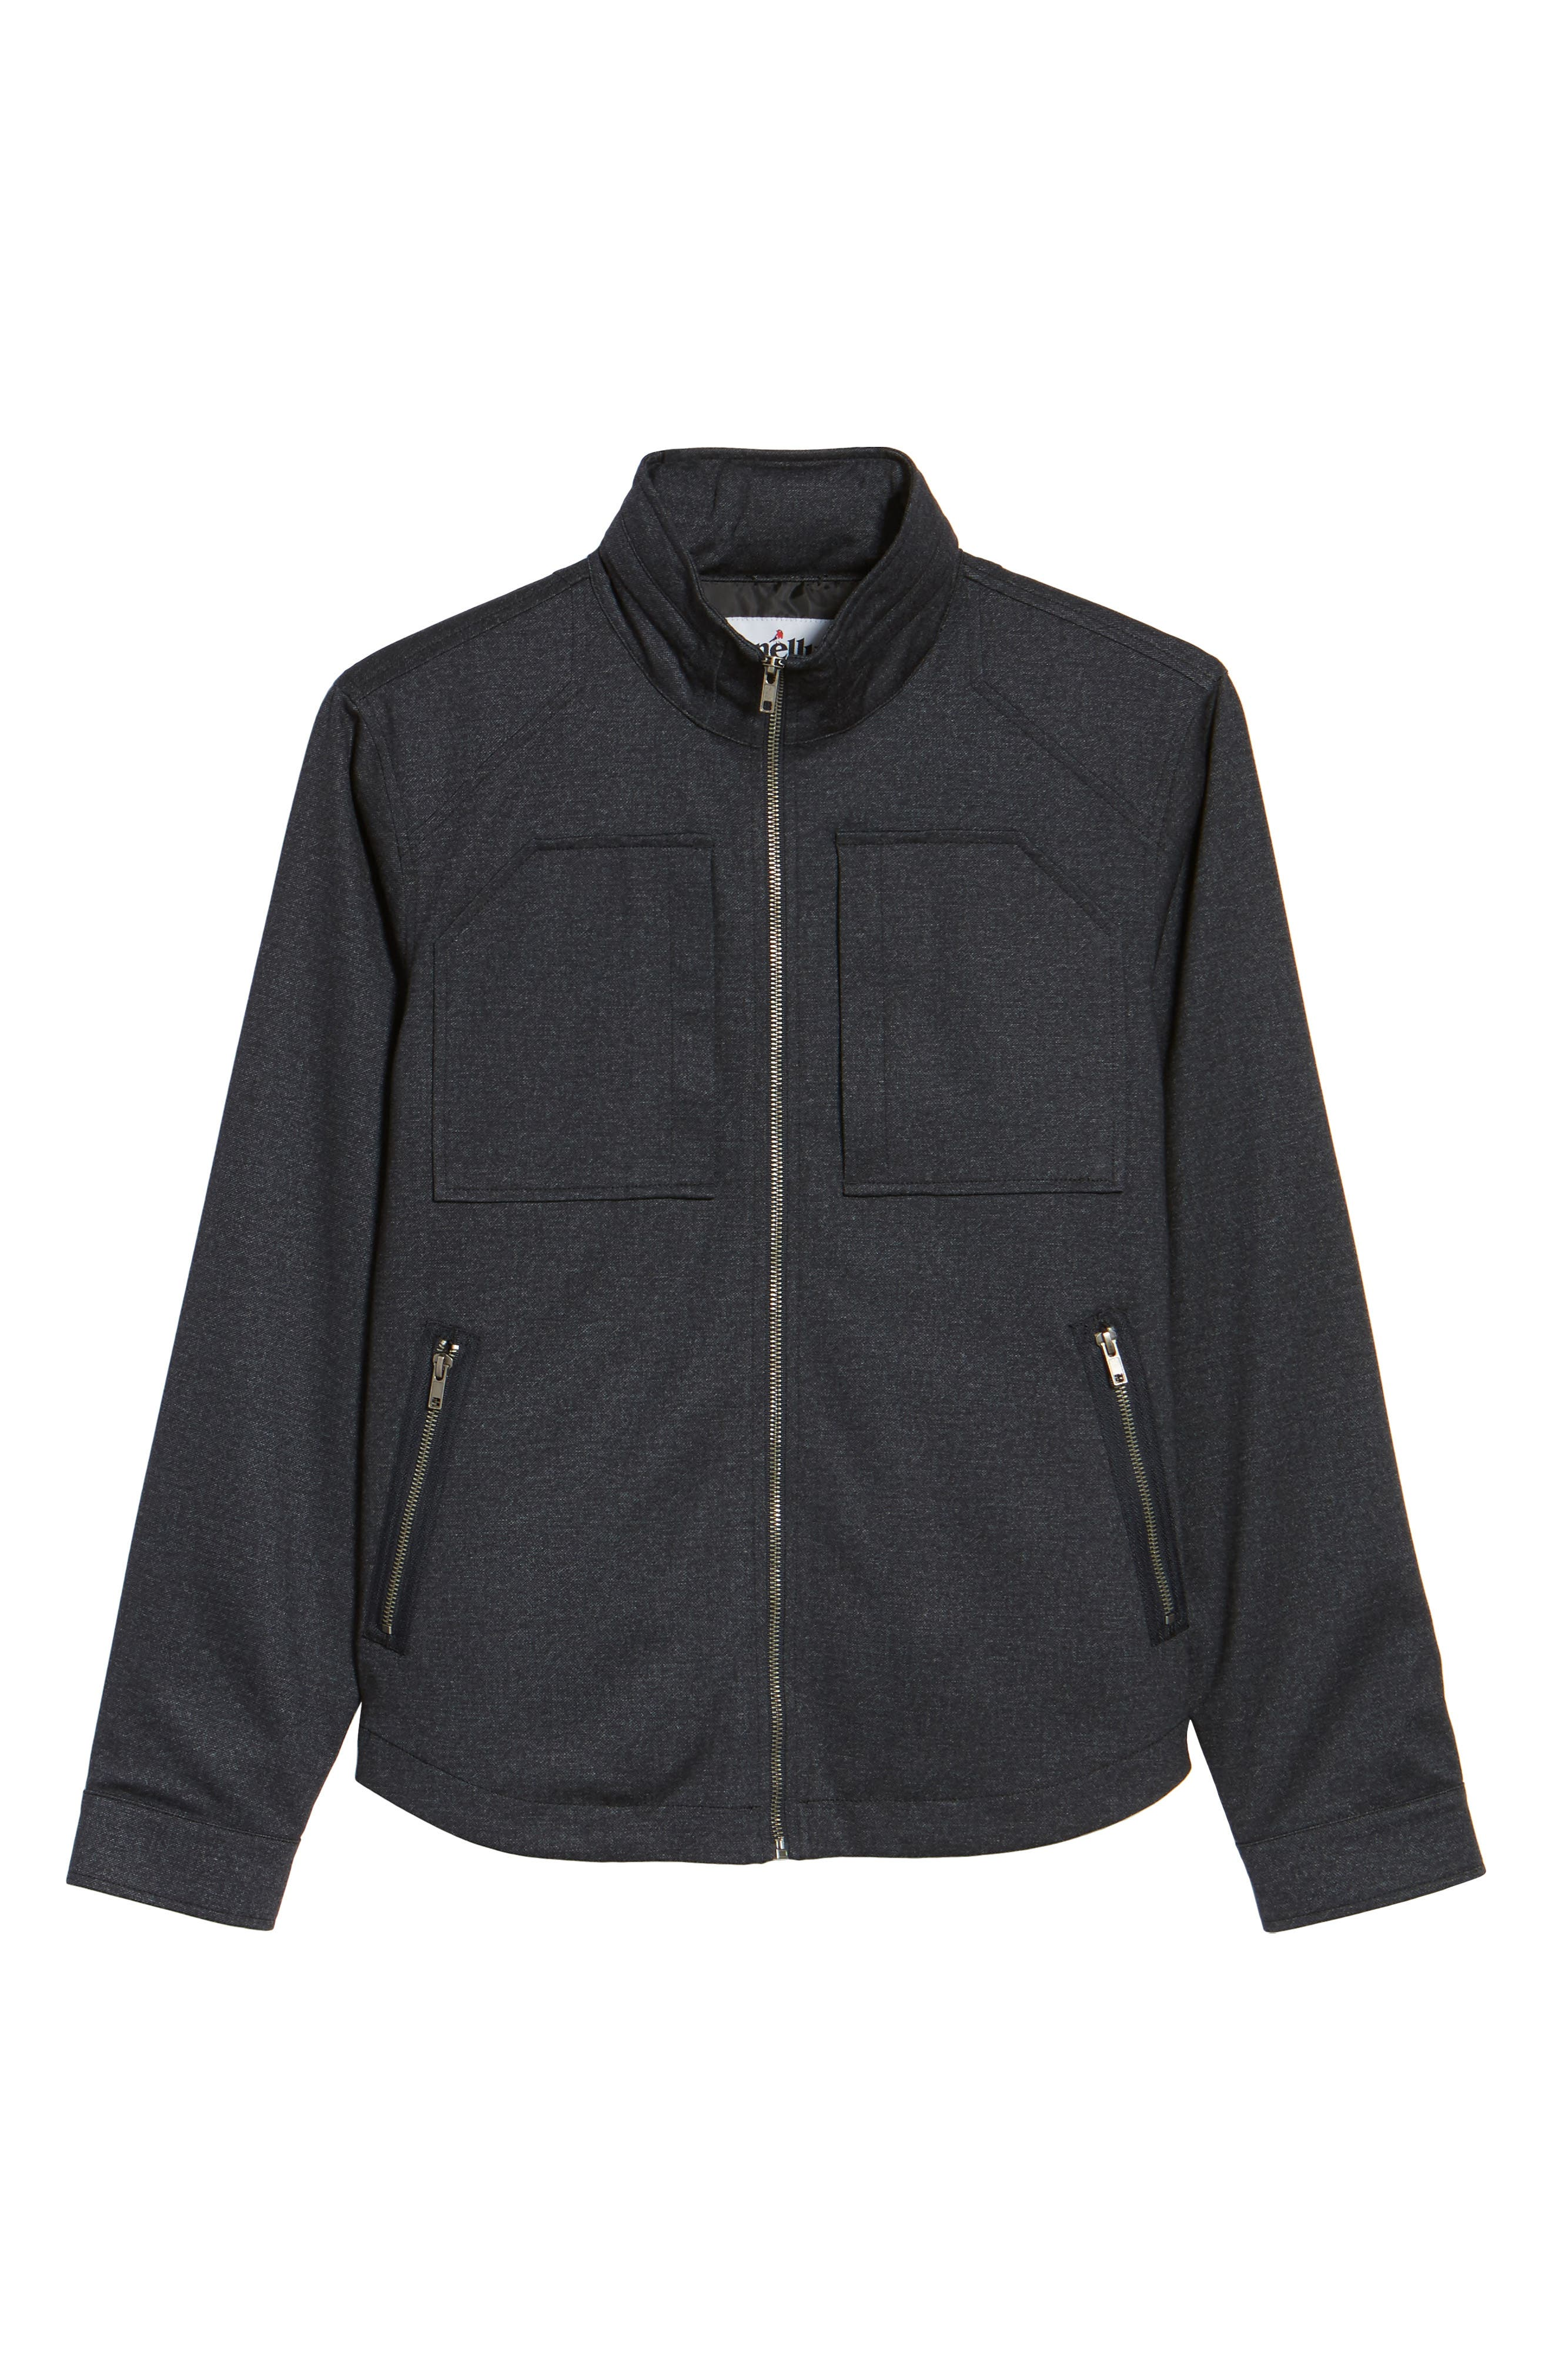 Zip Jacket,                             Alternate thumbnail 5, color,                             410